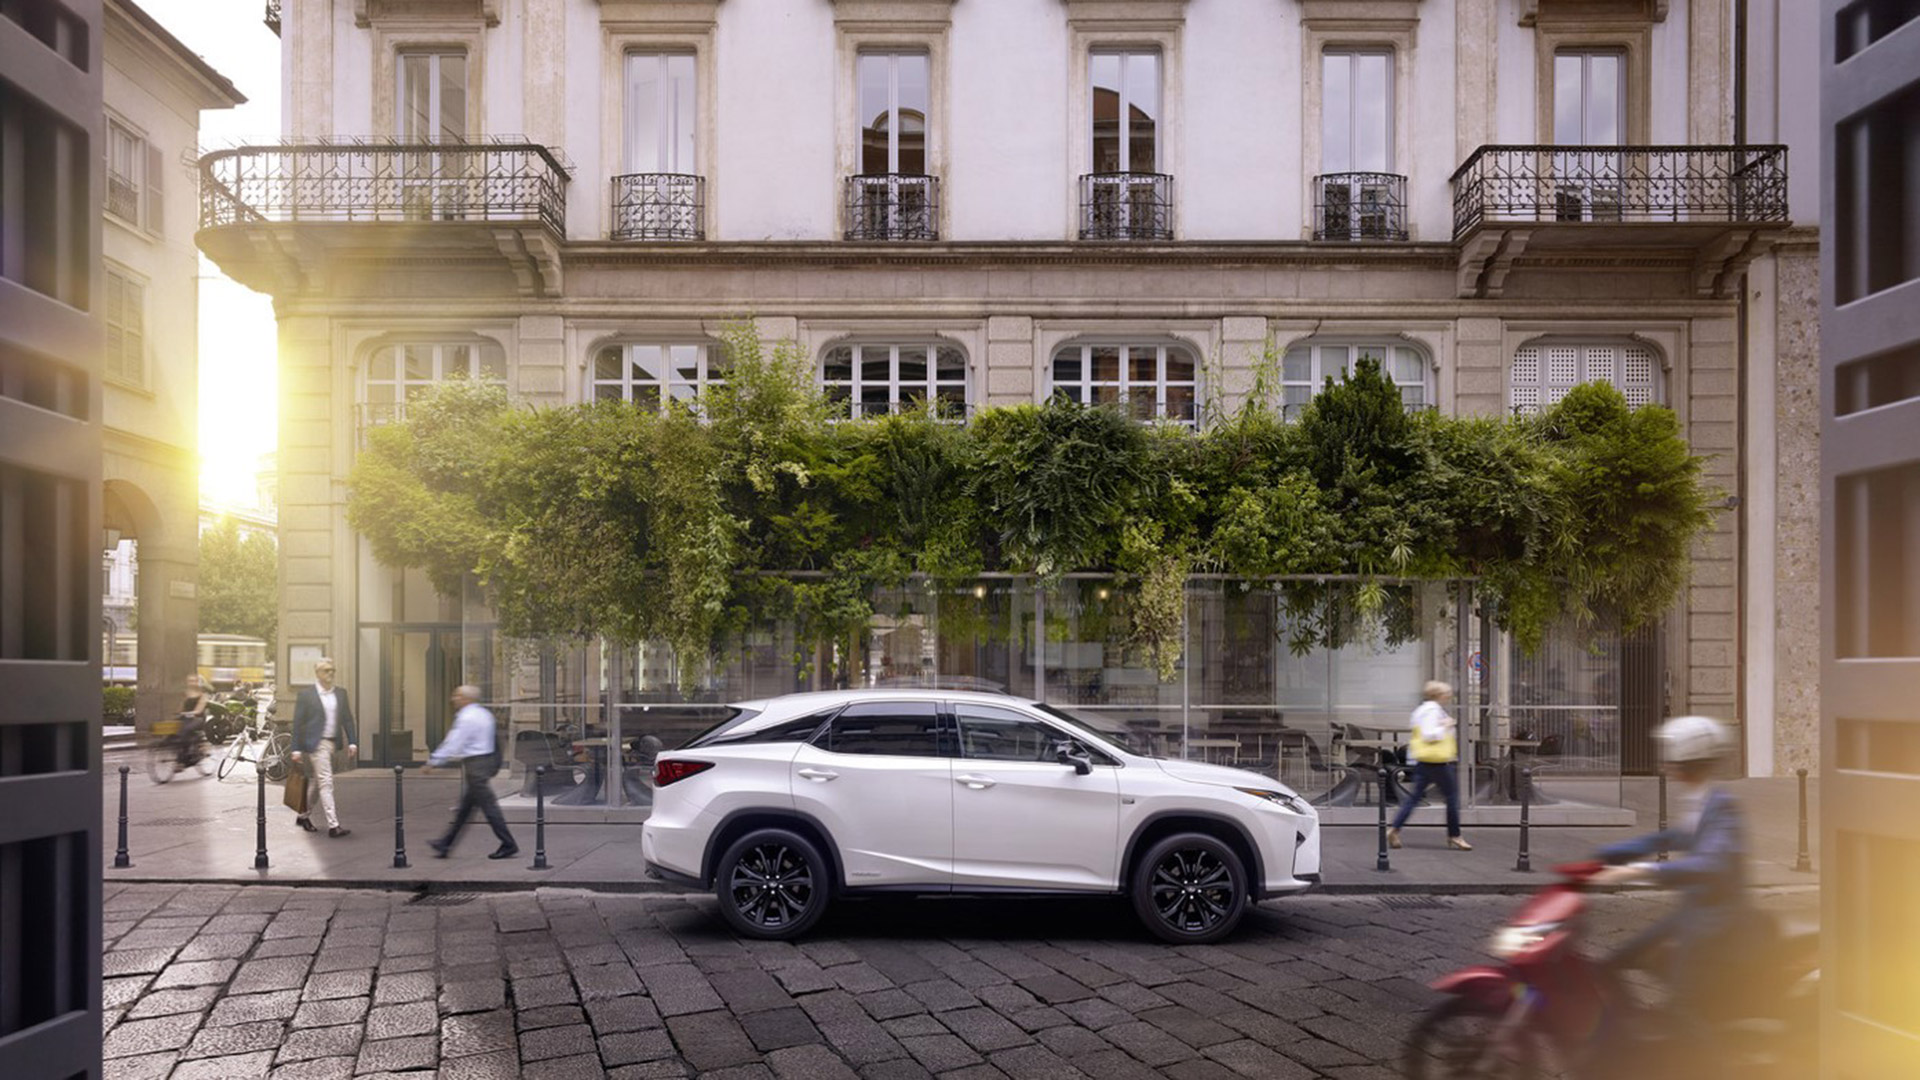 2019 020 Lexus RX pionier 1920x1080 hero